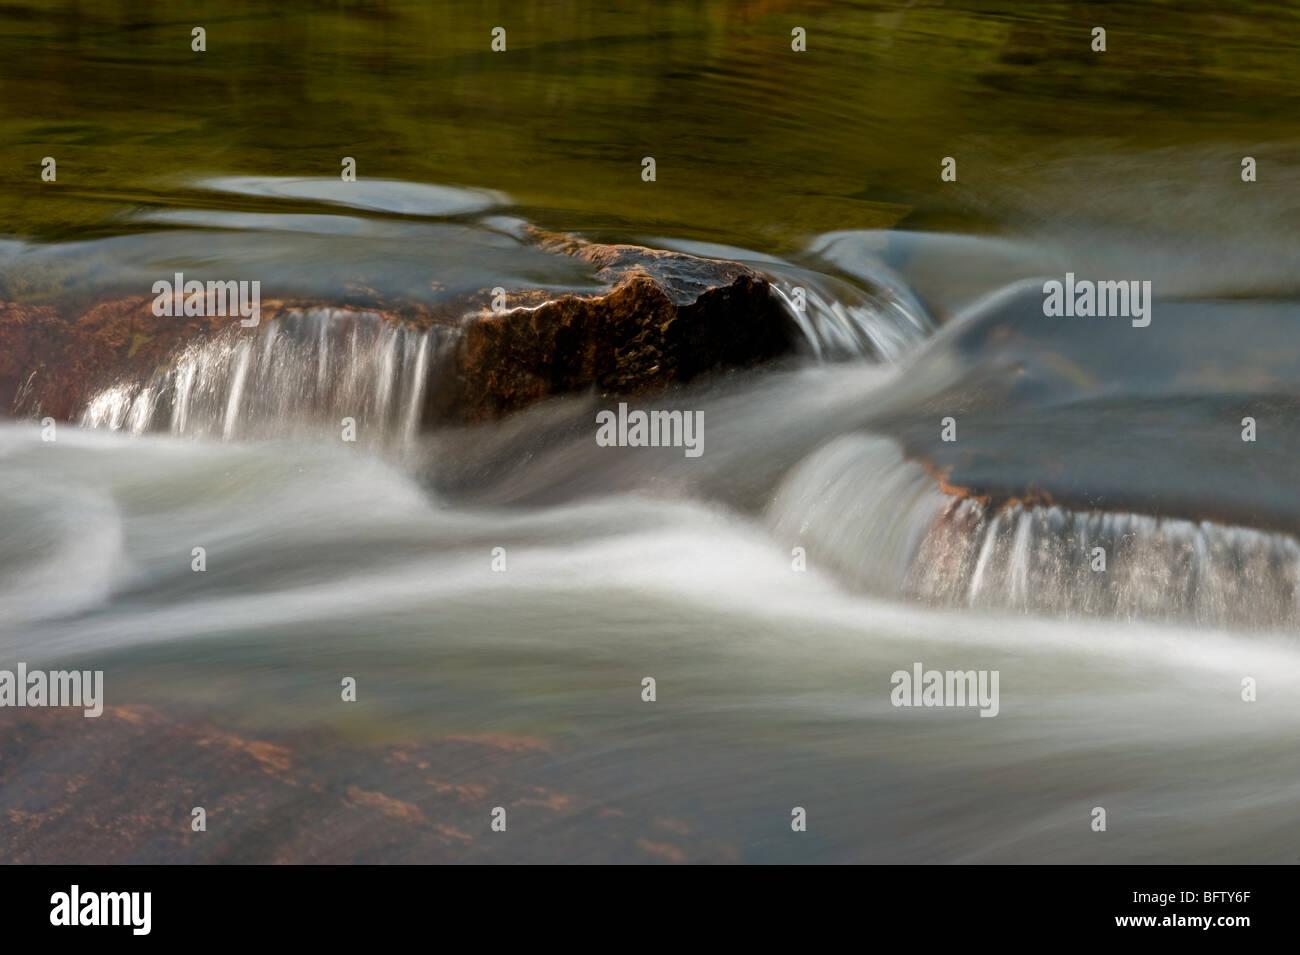 Waterfall on the Mahzenazing River, Killarney, Ontario, Canada - Stock Image